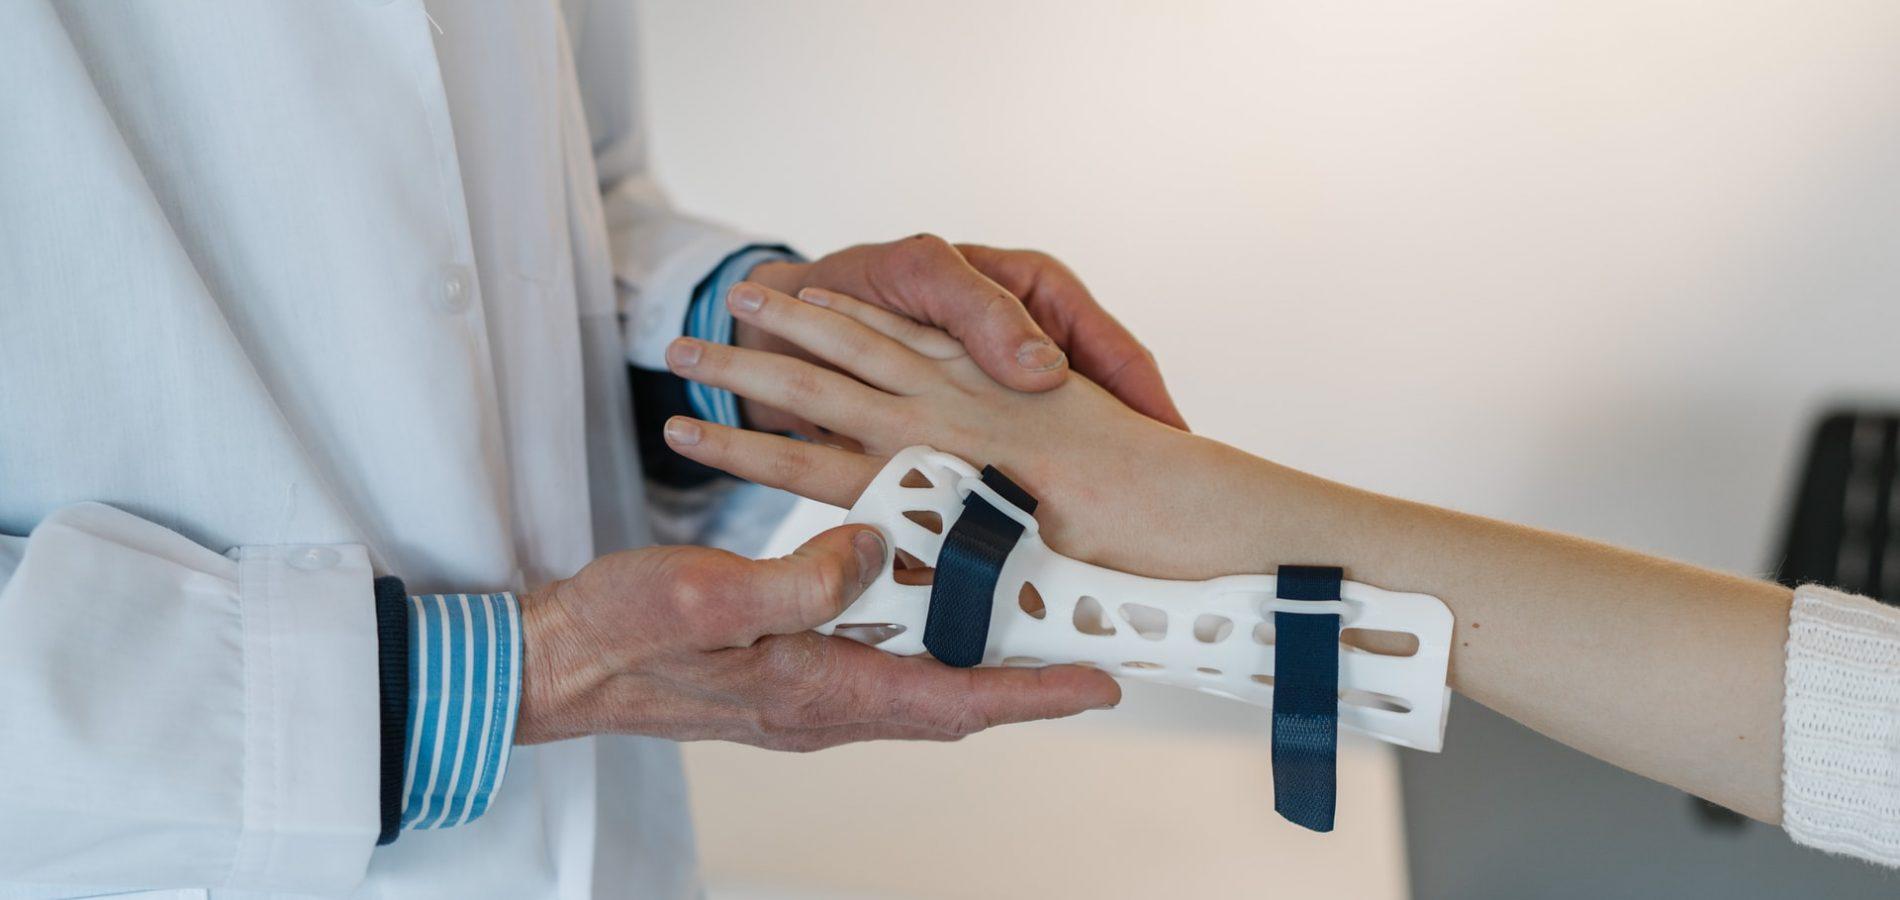 medical device 3d print prosthesis